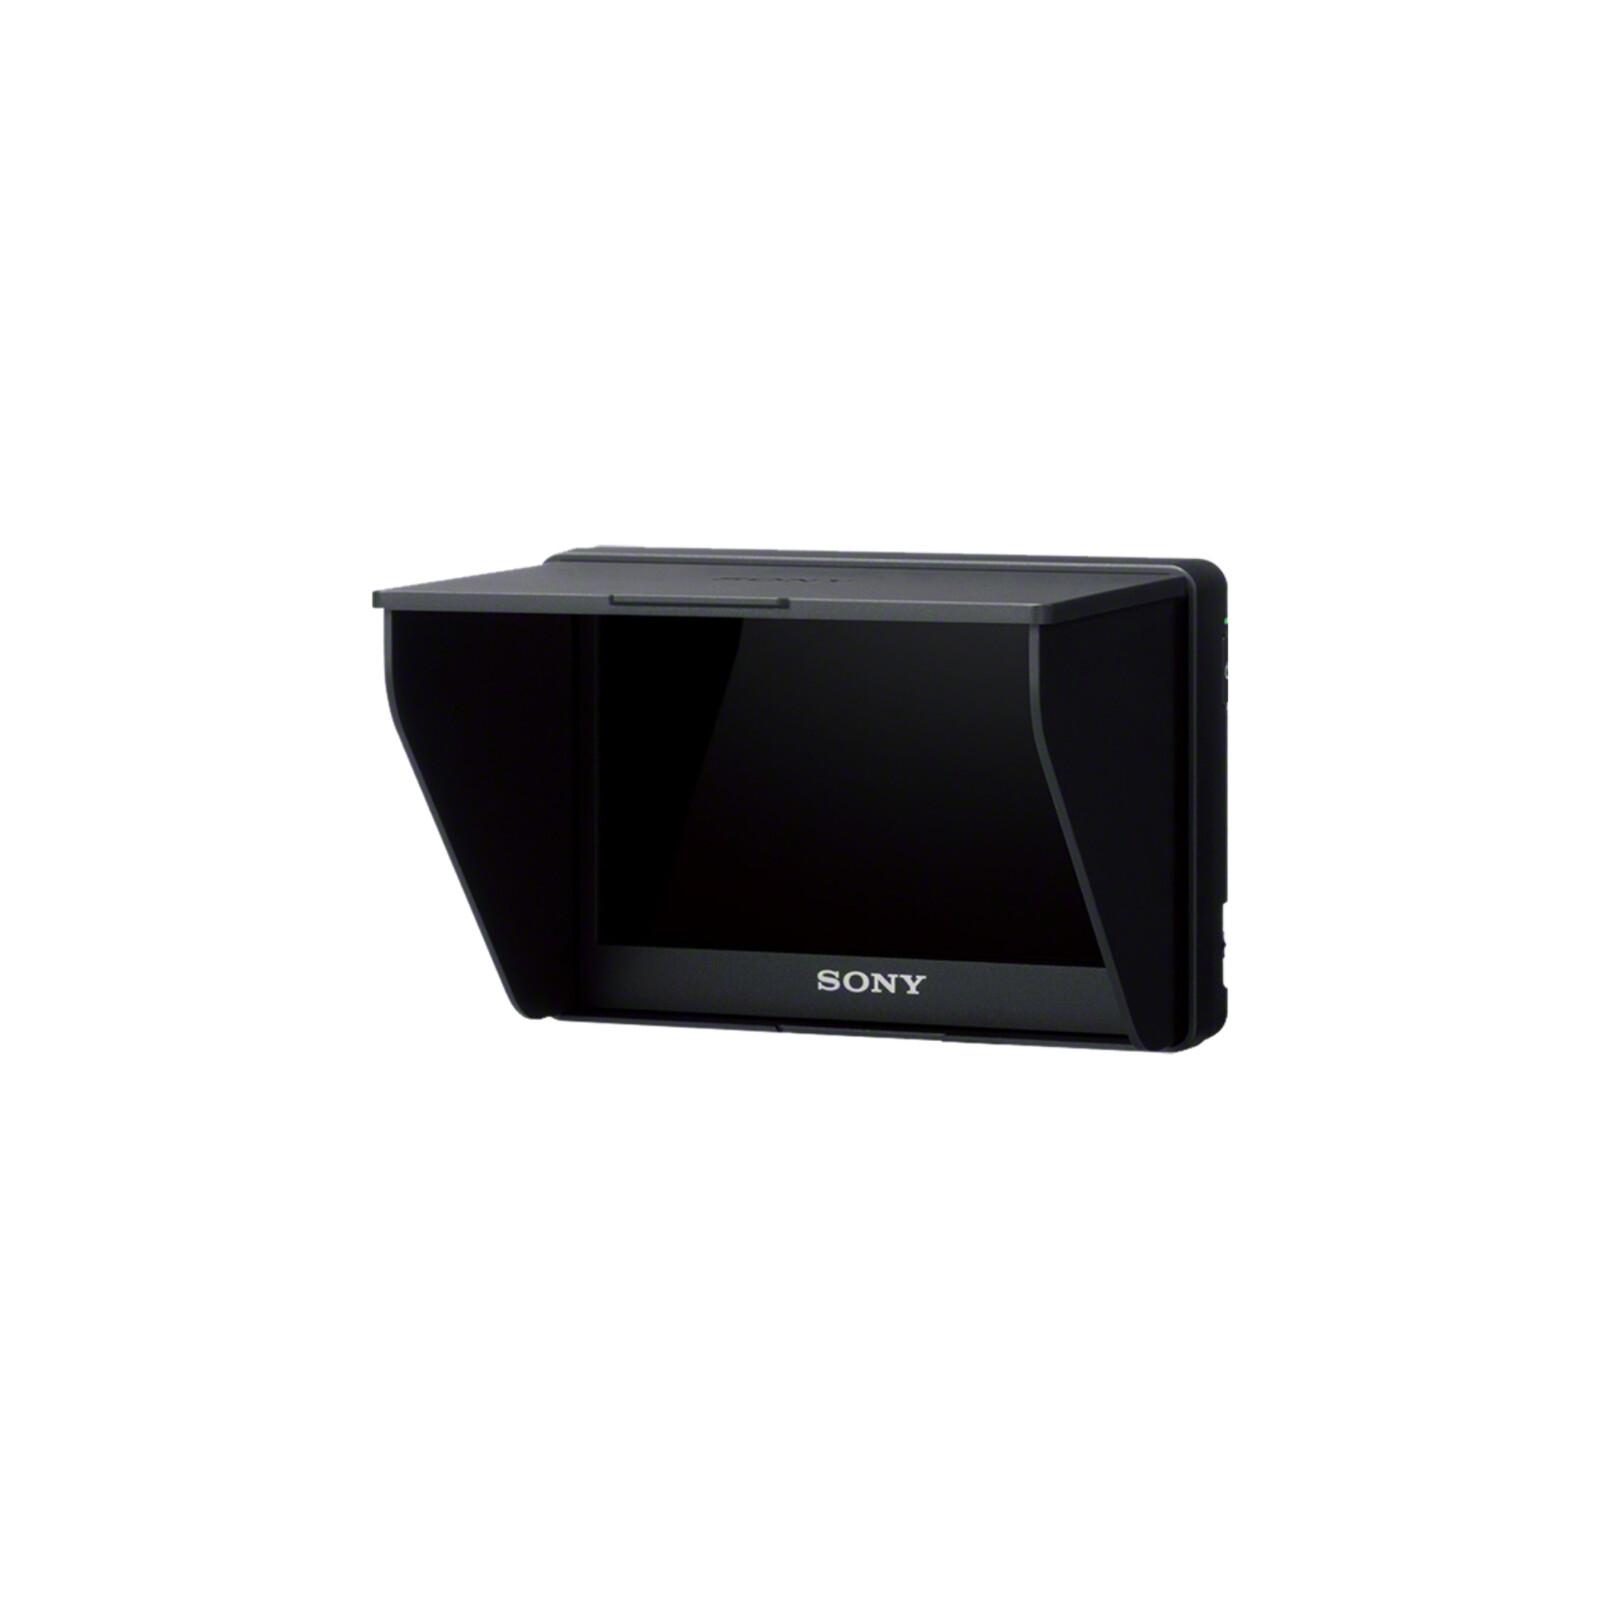 Sony CLM-V55 LC Display